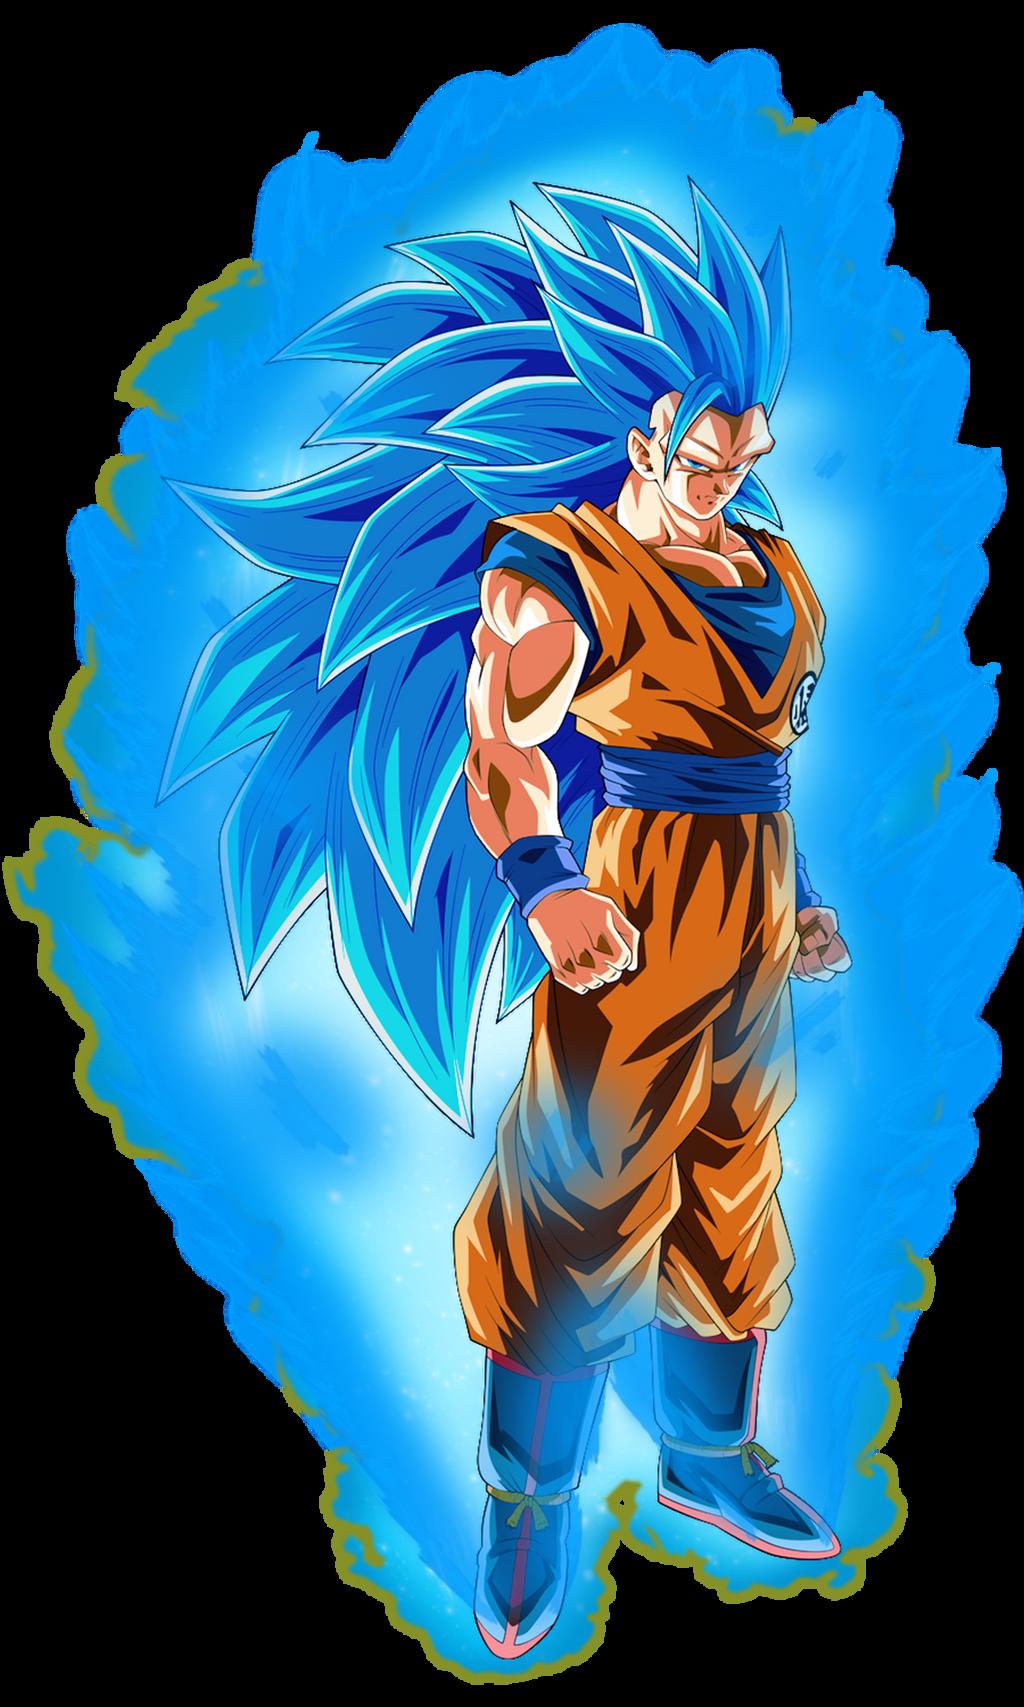 Goku Ssj3 Blue By Groxkof On Deviantart Dragon Ball Super Manga Anime Dragon Ball Super Dragon Ball Super